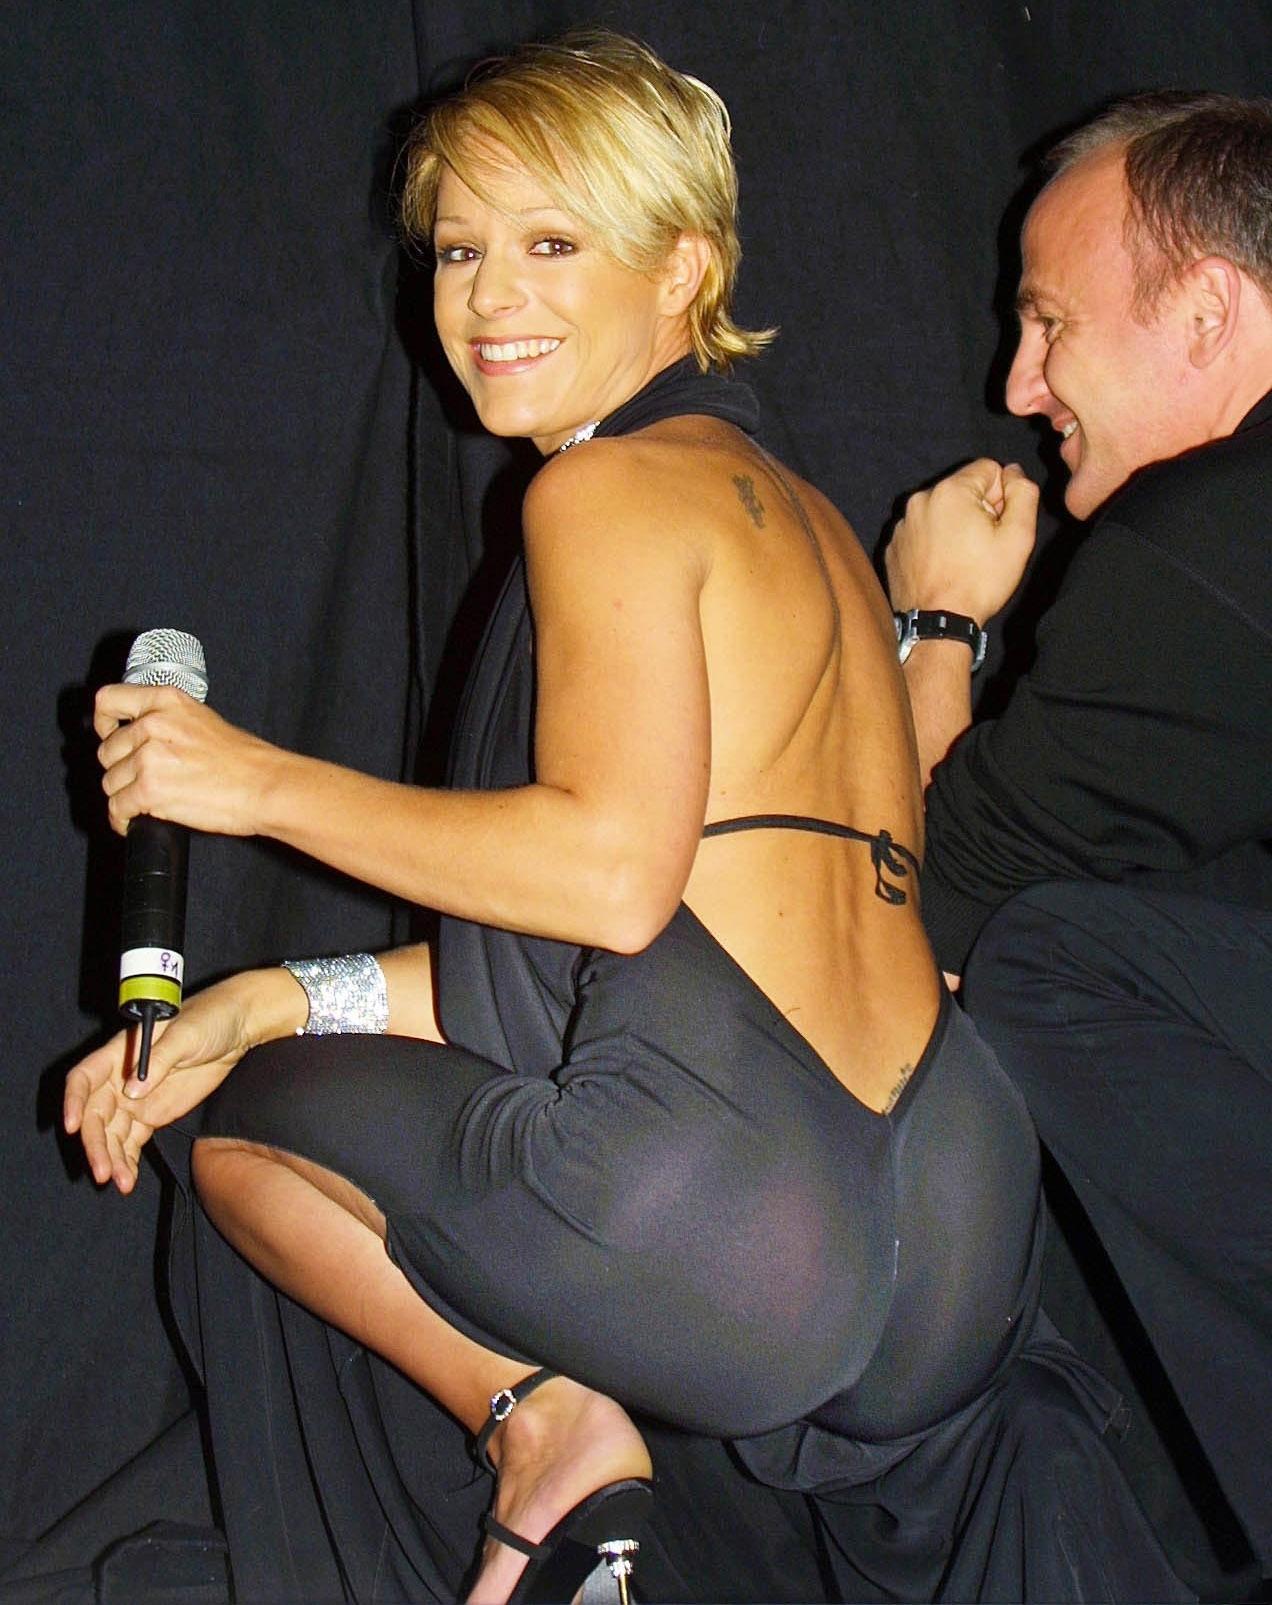 Мишель (Таня Хьюер) голая. Фото - 3